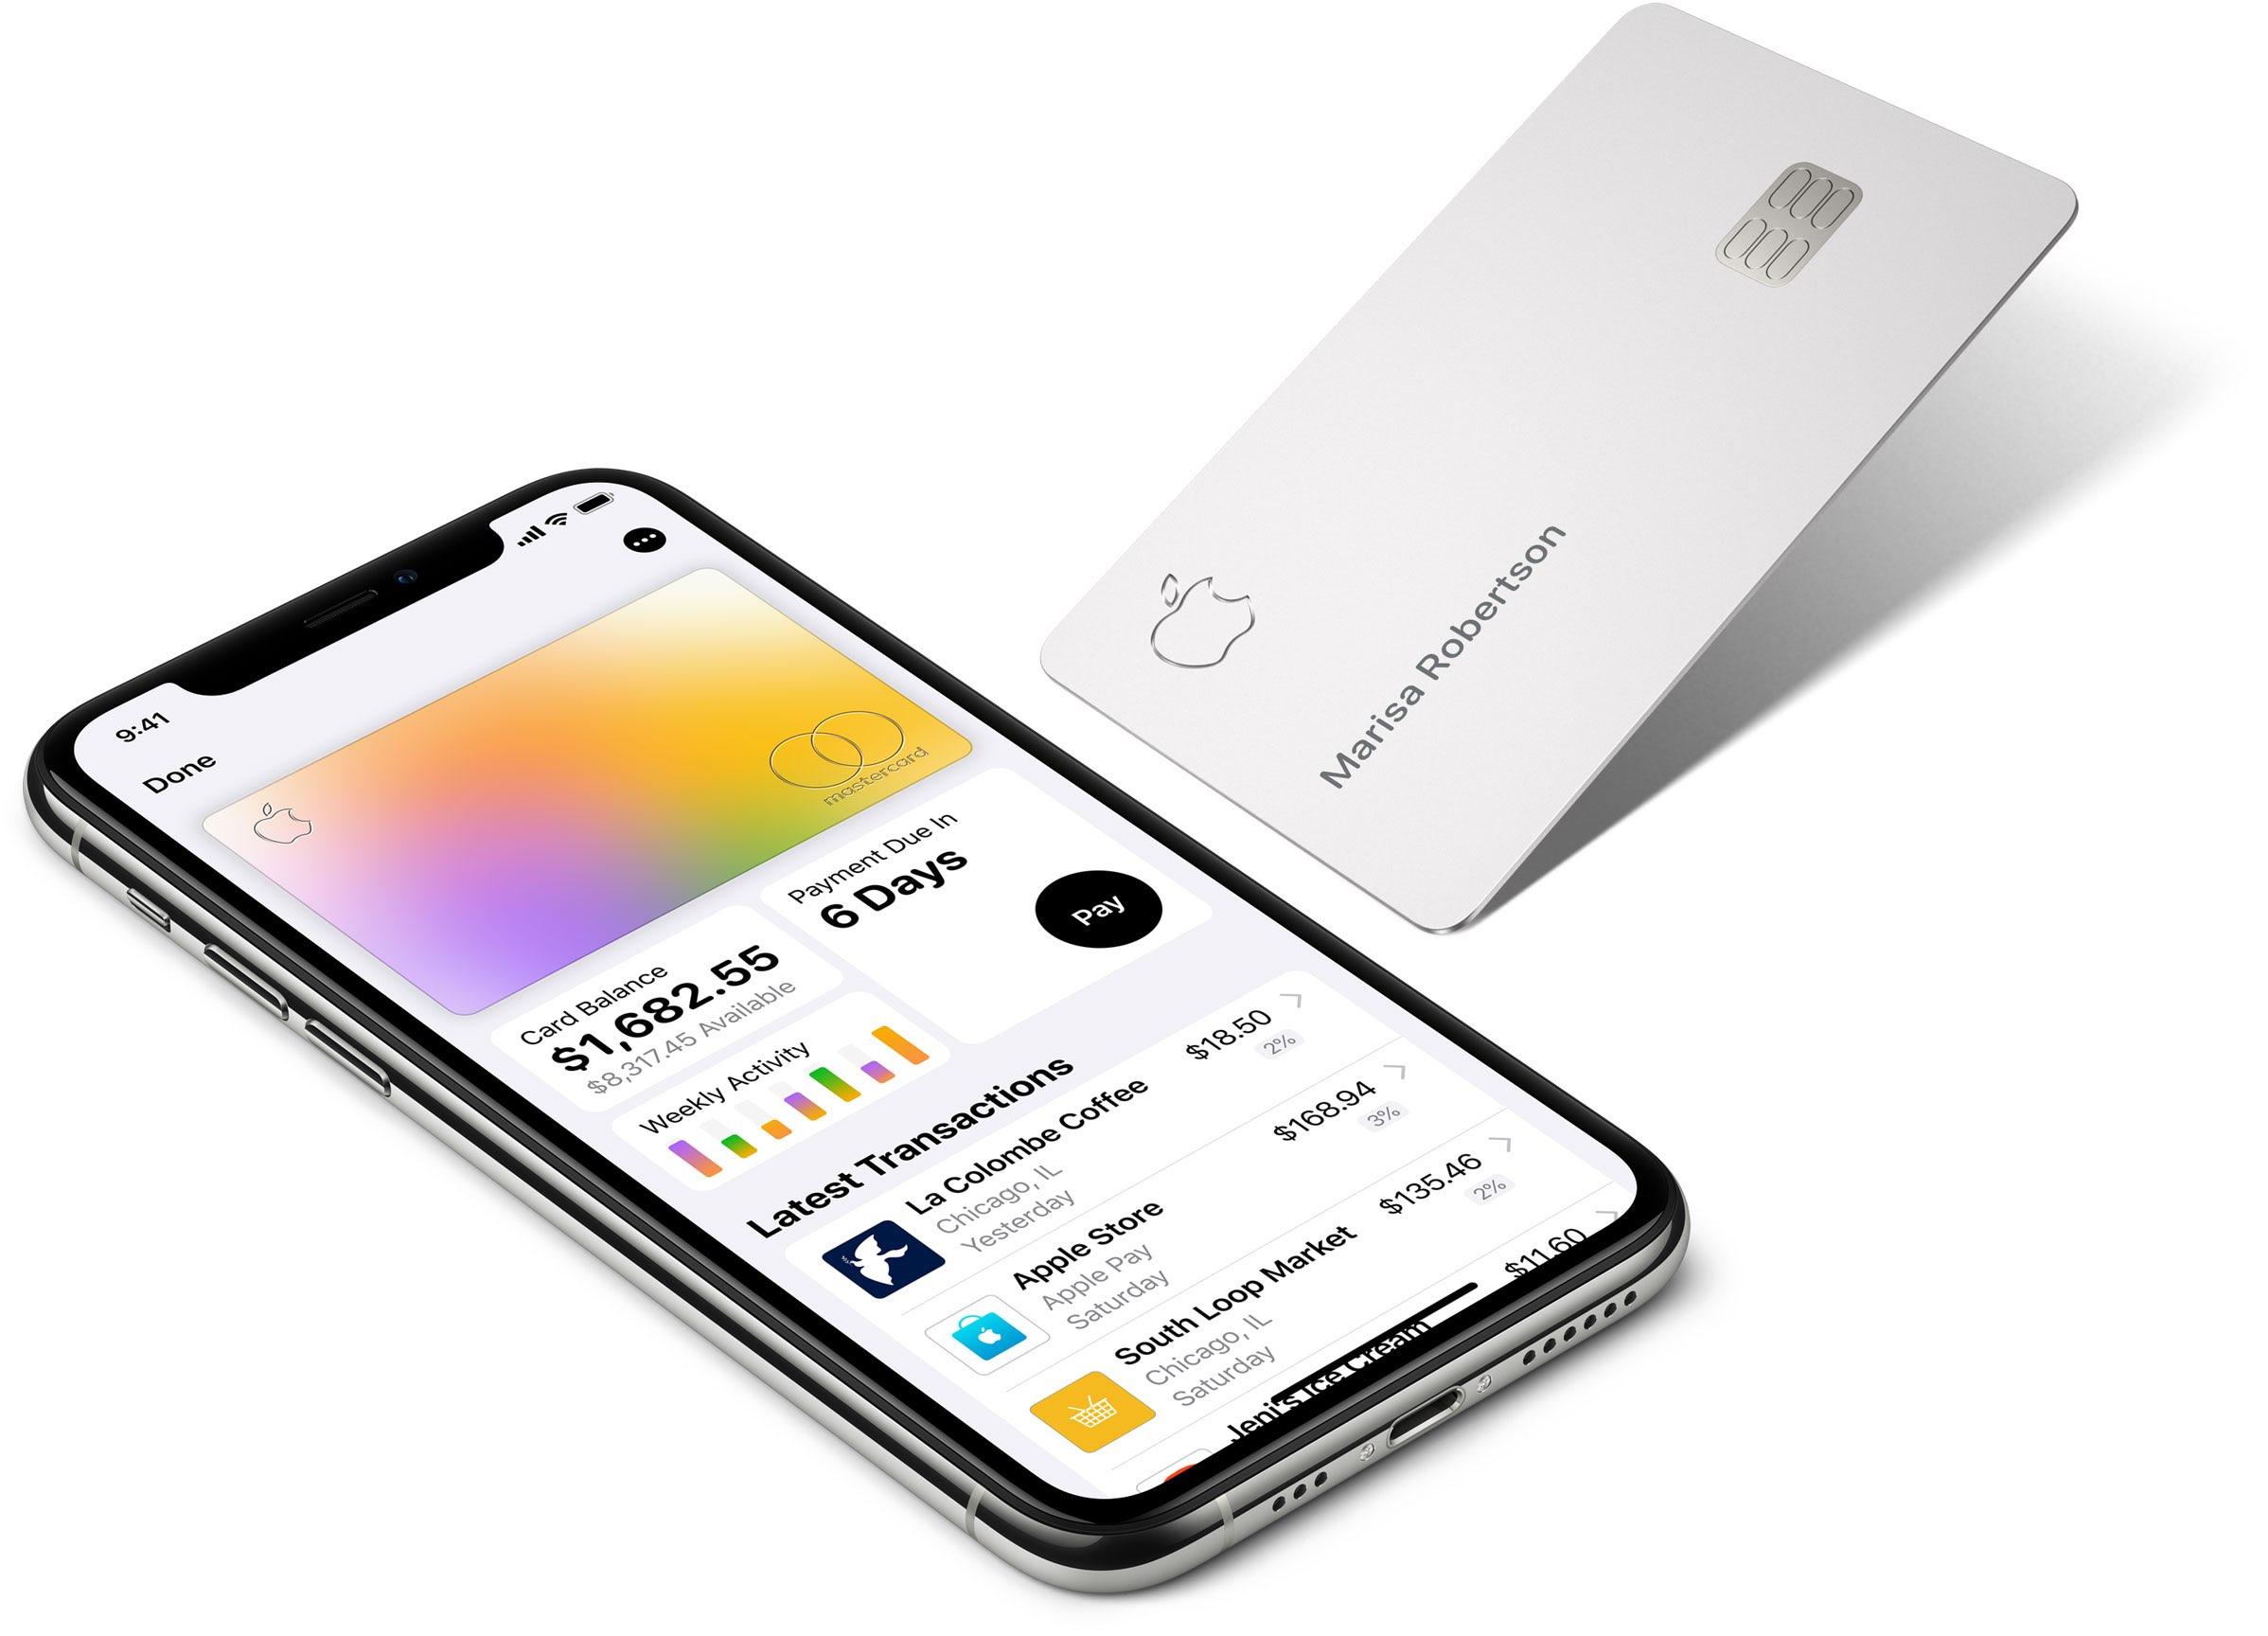 An Apple Card shown next to an iPhone running the Wallet app